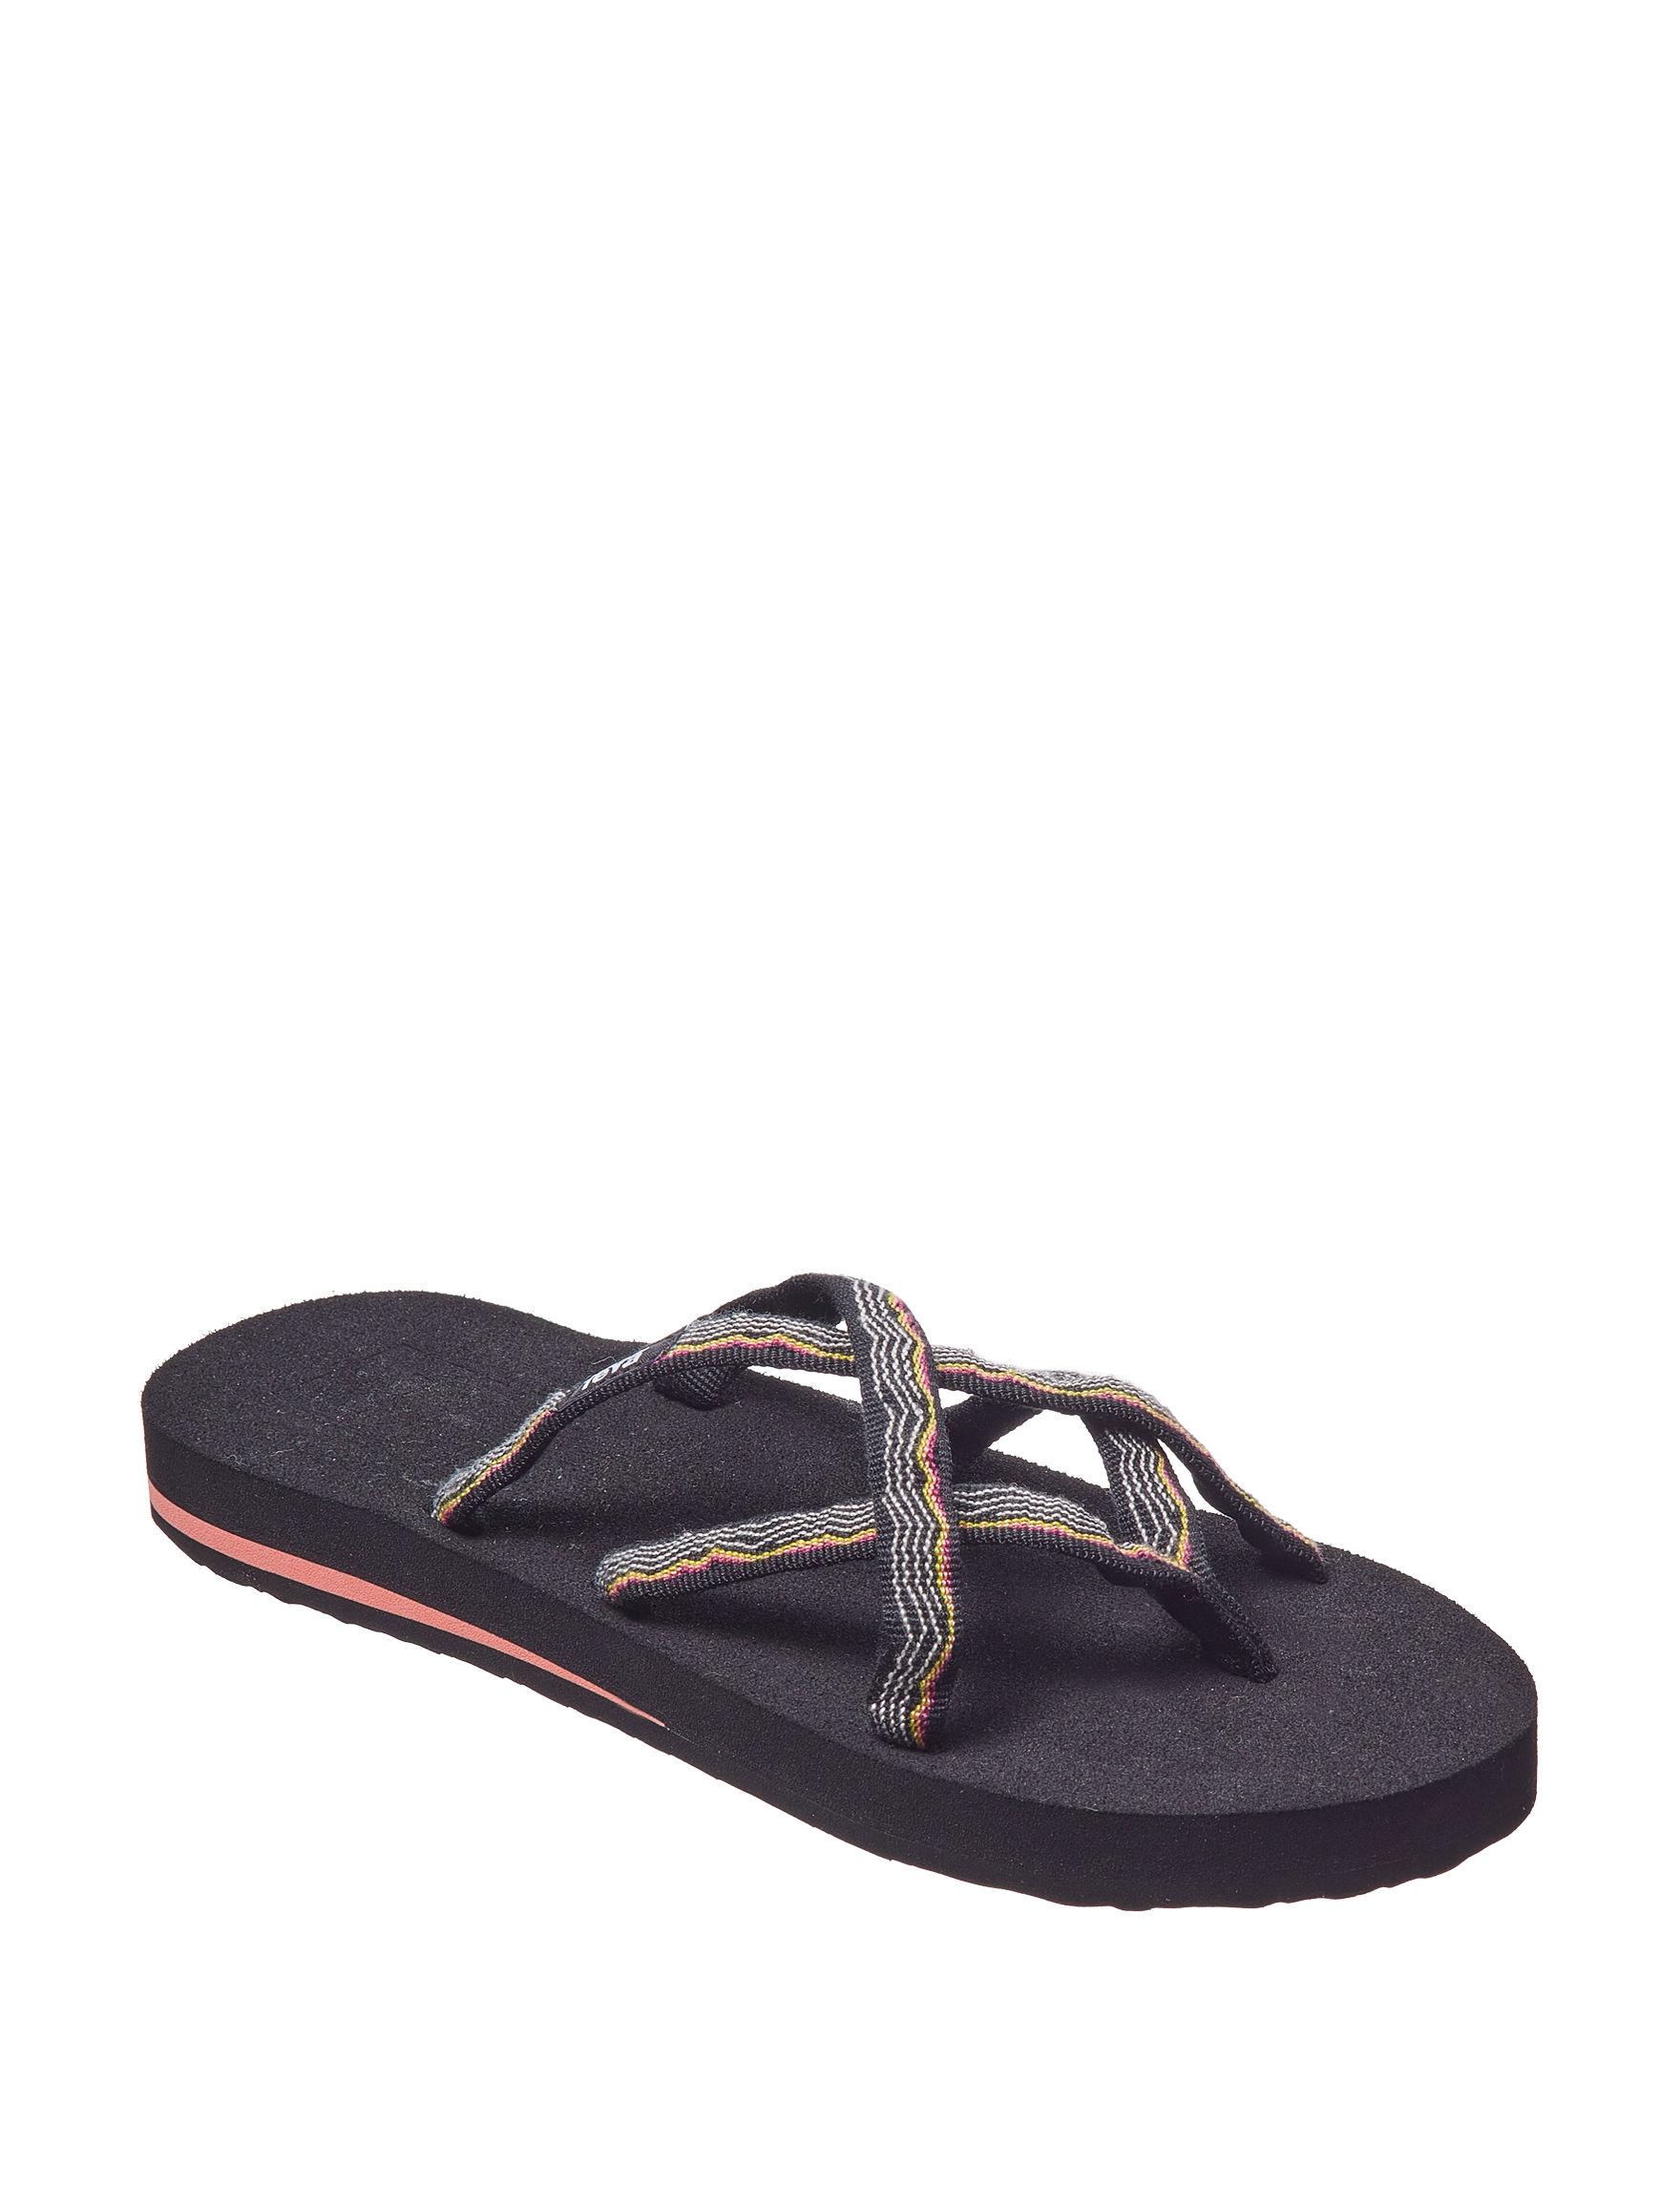 Teva Orange Flip Flops Sport Sandals